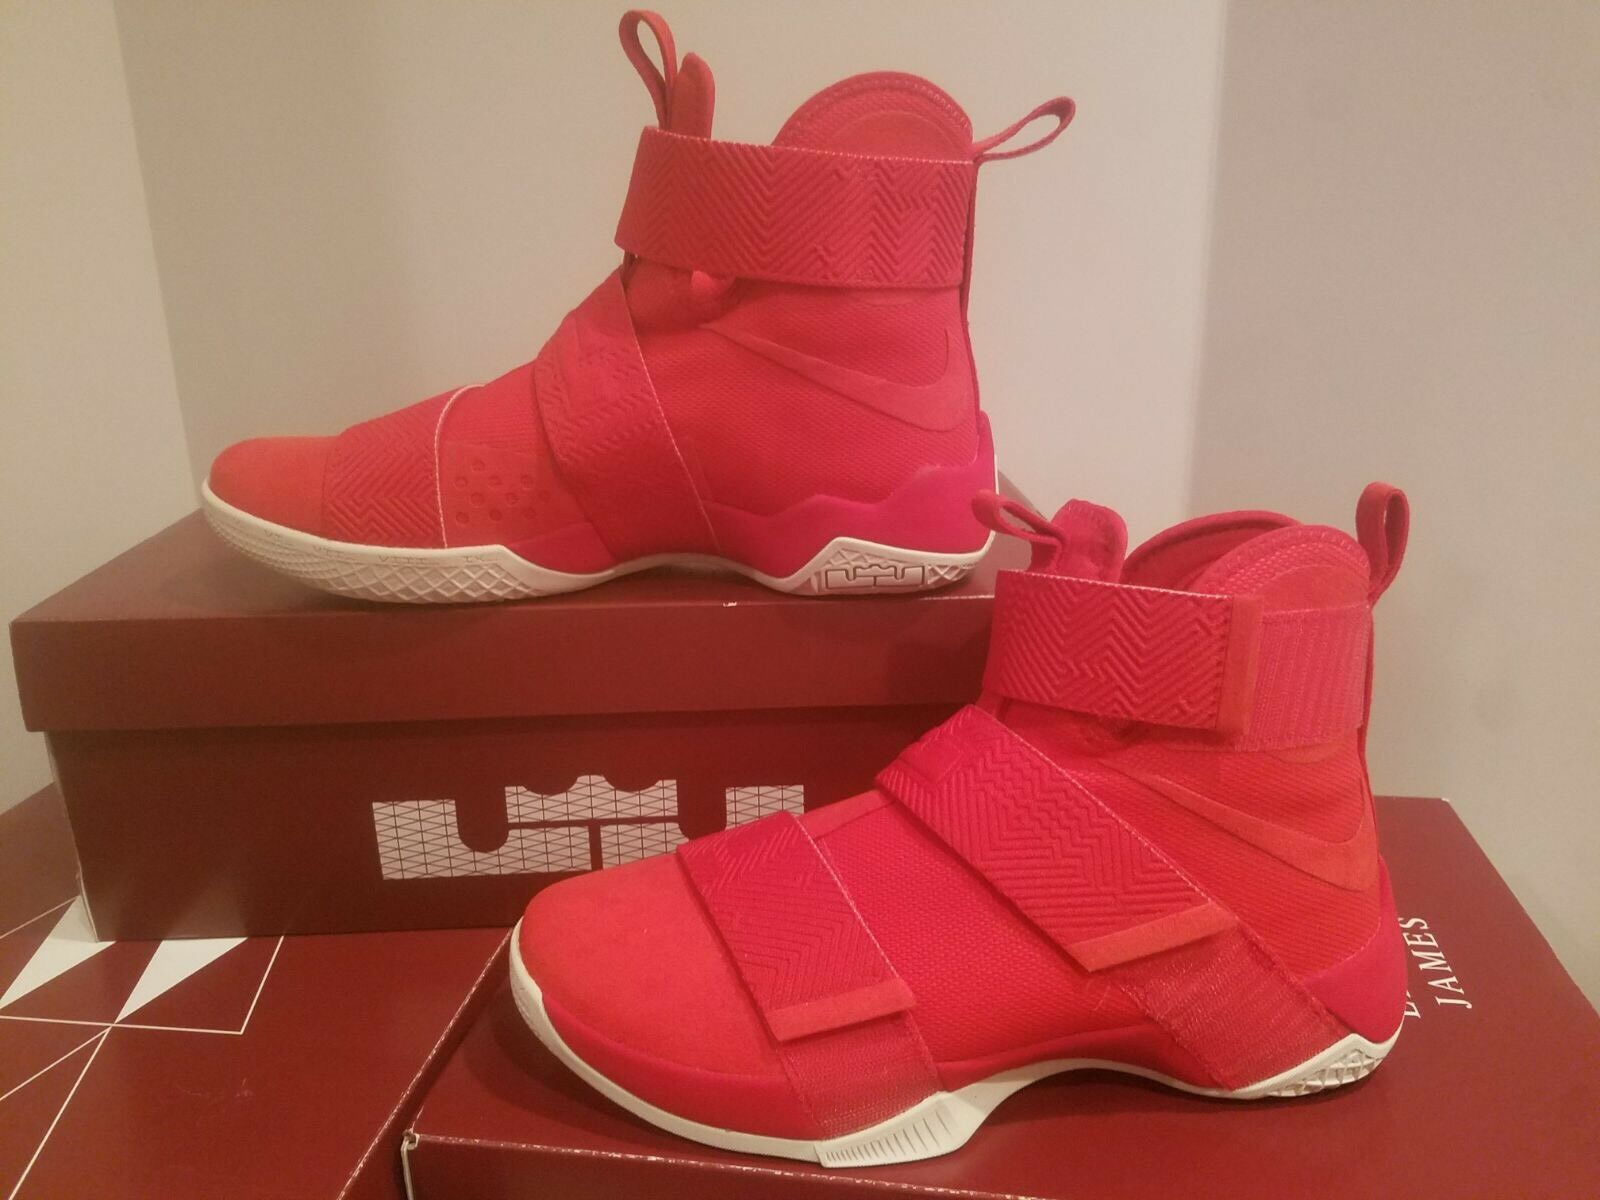 Nike Lebron Soldier Men's SFG LUX  University Red 911306-600 Multi Comfortable